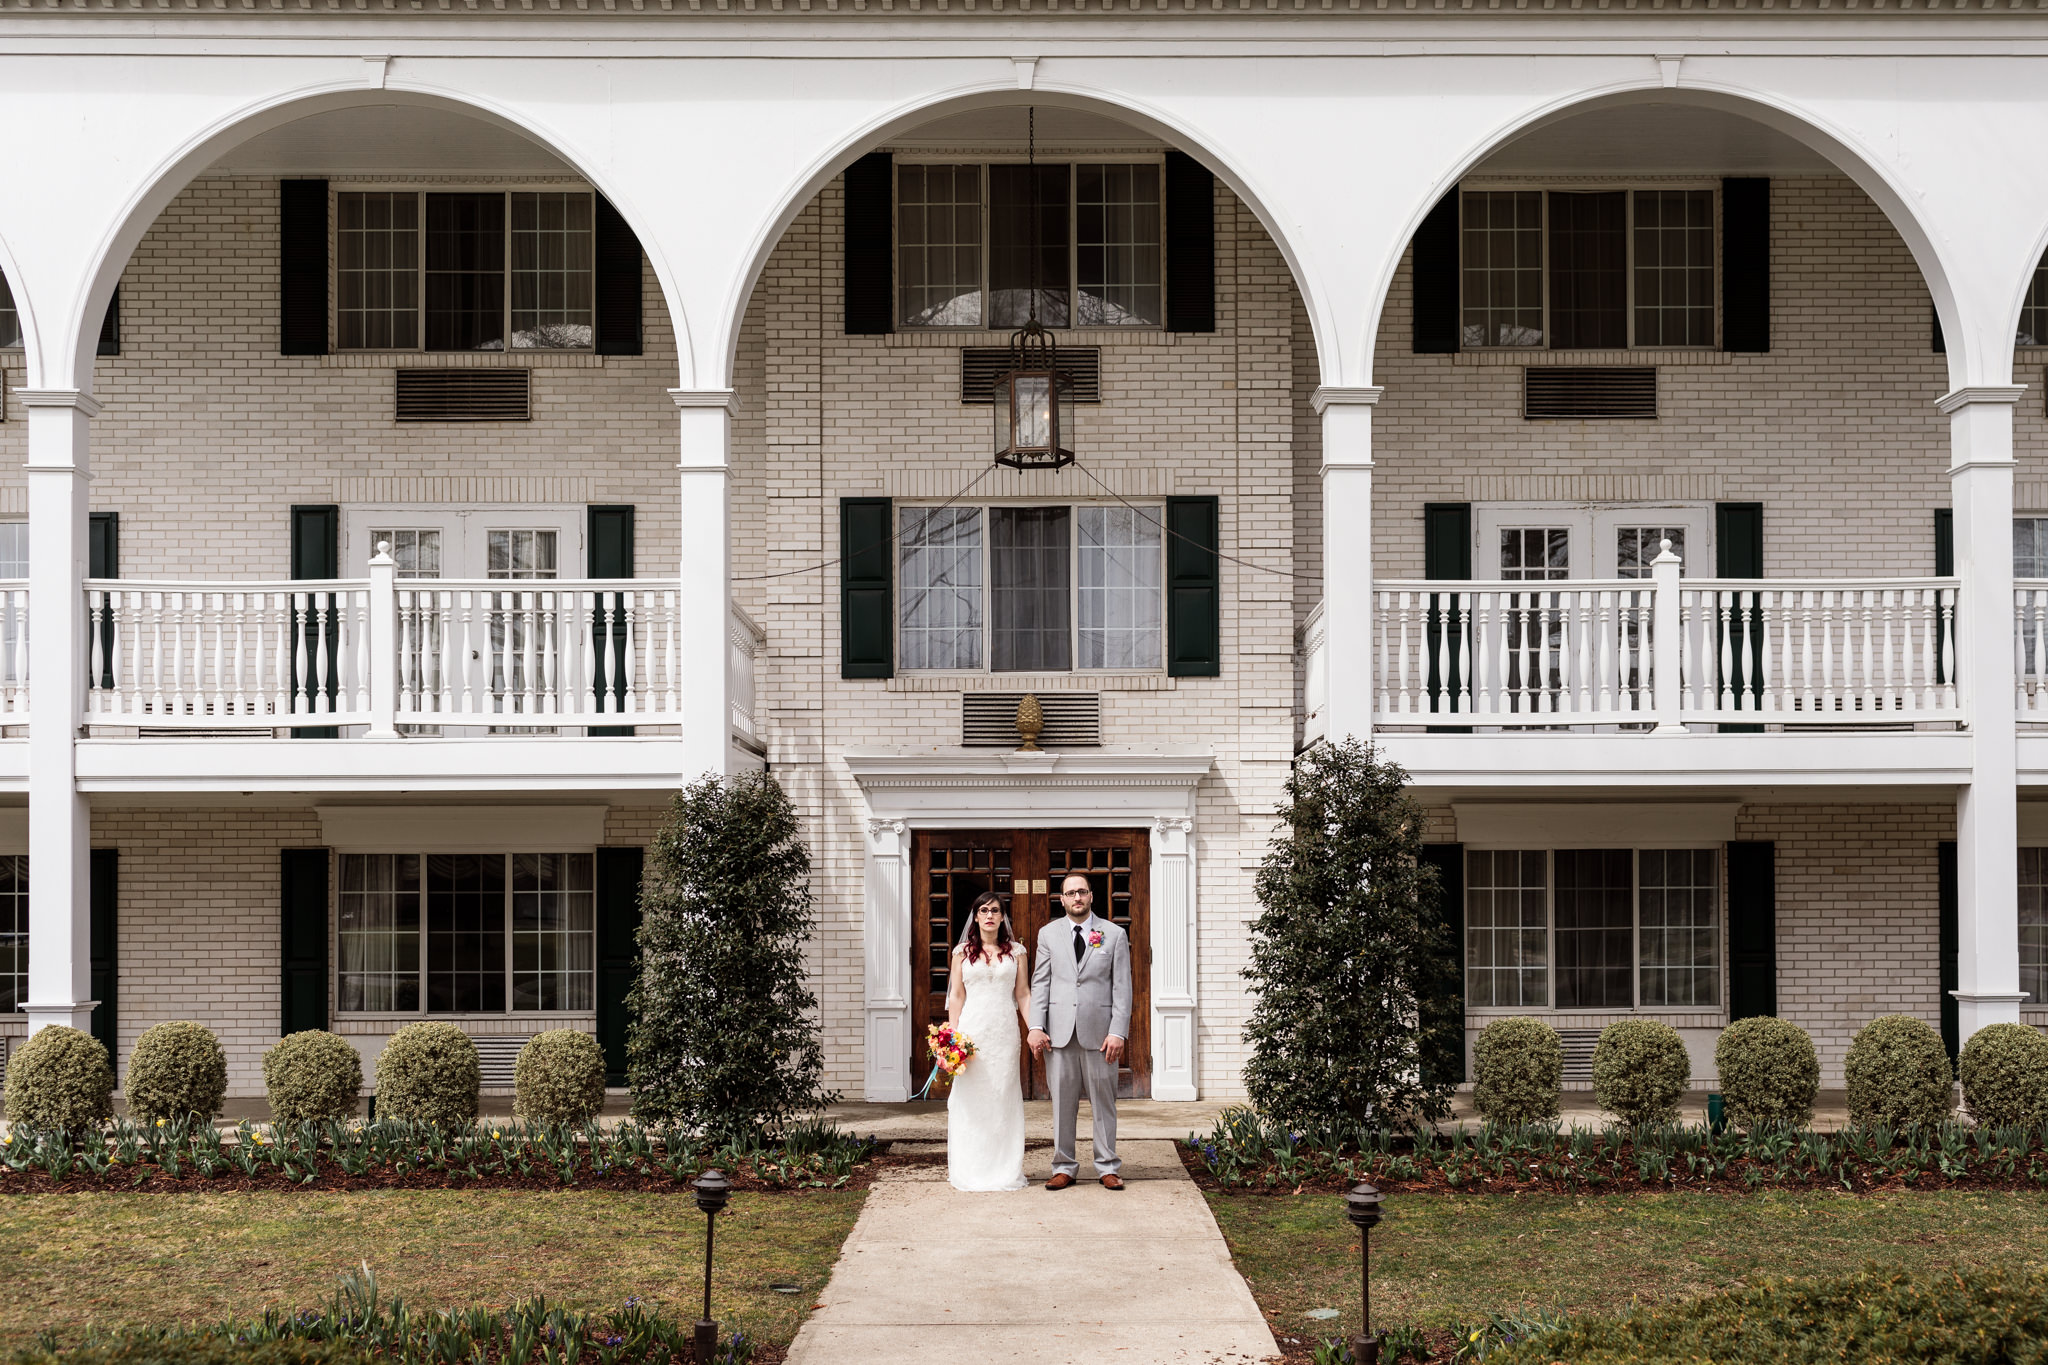 Hanchar_Madison_Hotel_NJ_Wedding_7R5A8644.jpg